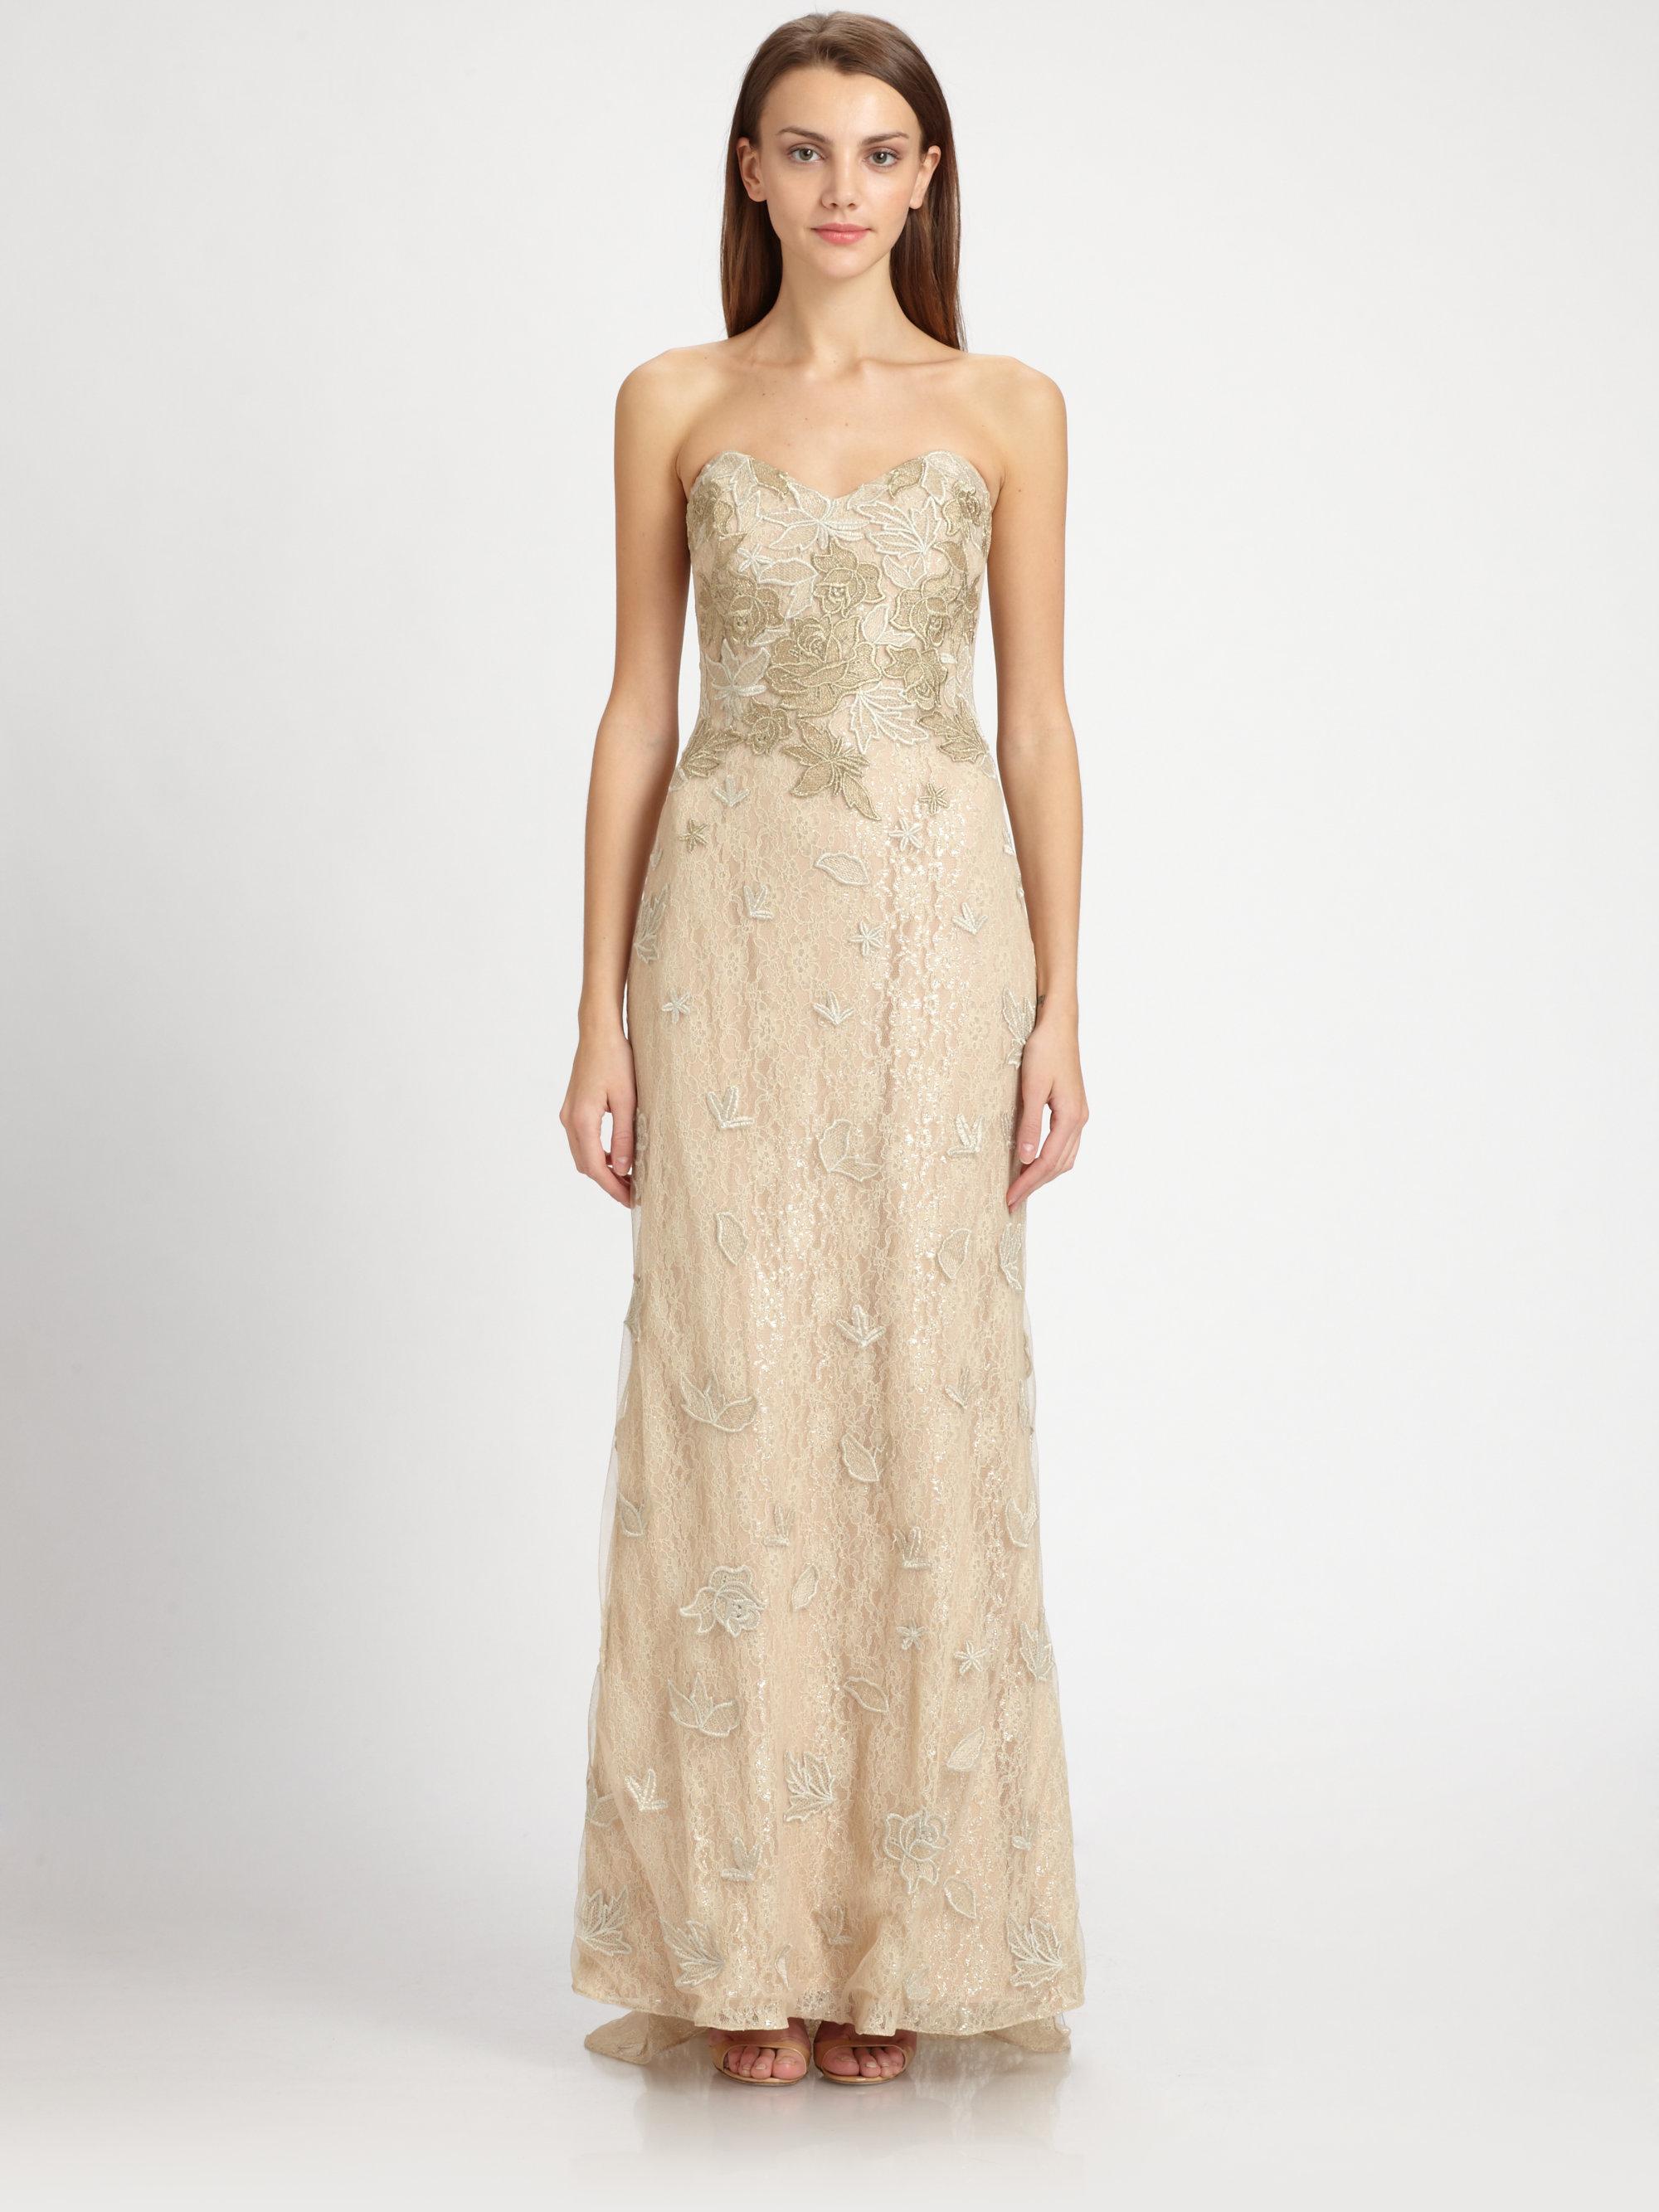 Lyst - Badgley Mischka Strapless Metallic Lace Gown in Metallic